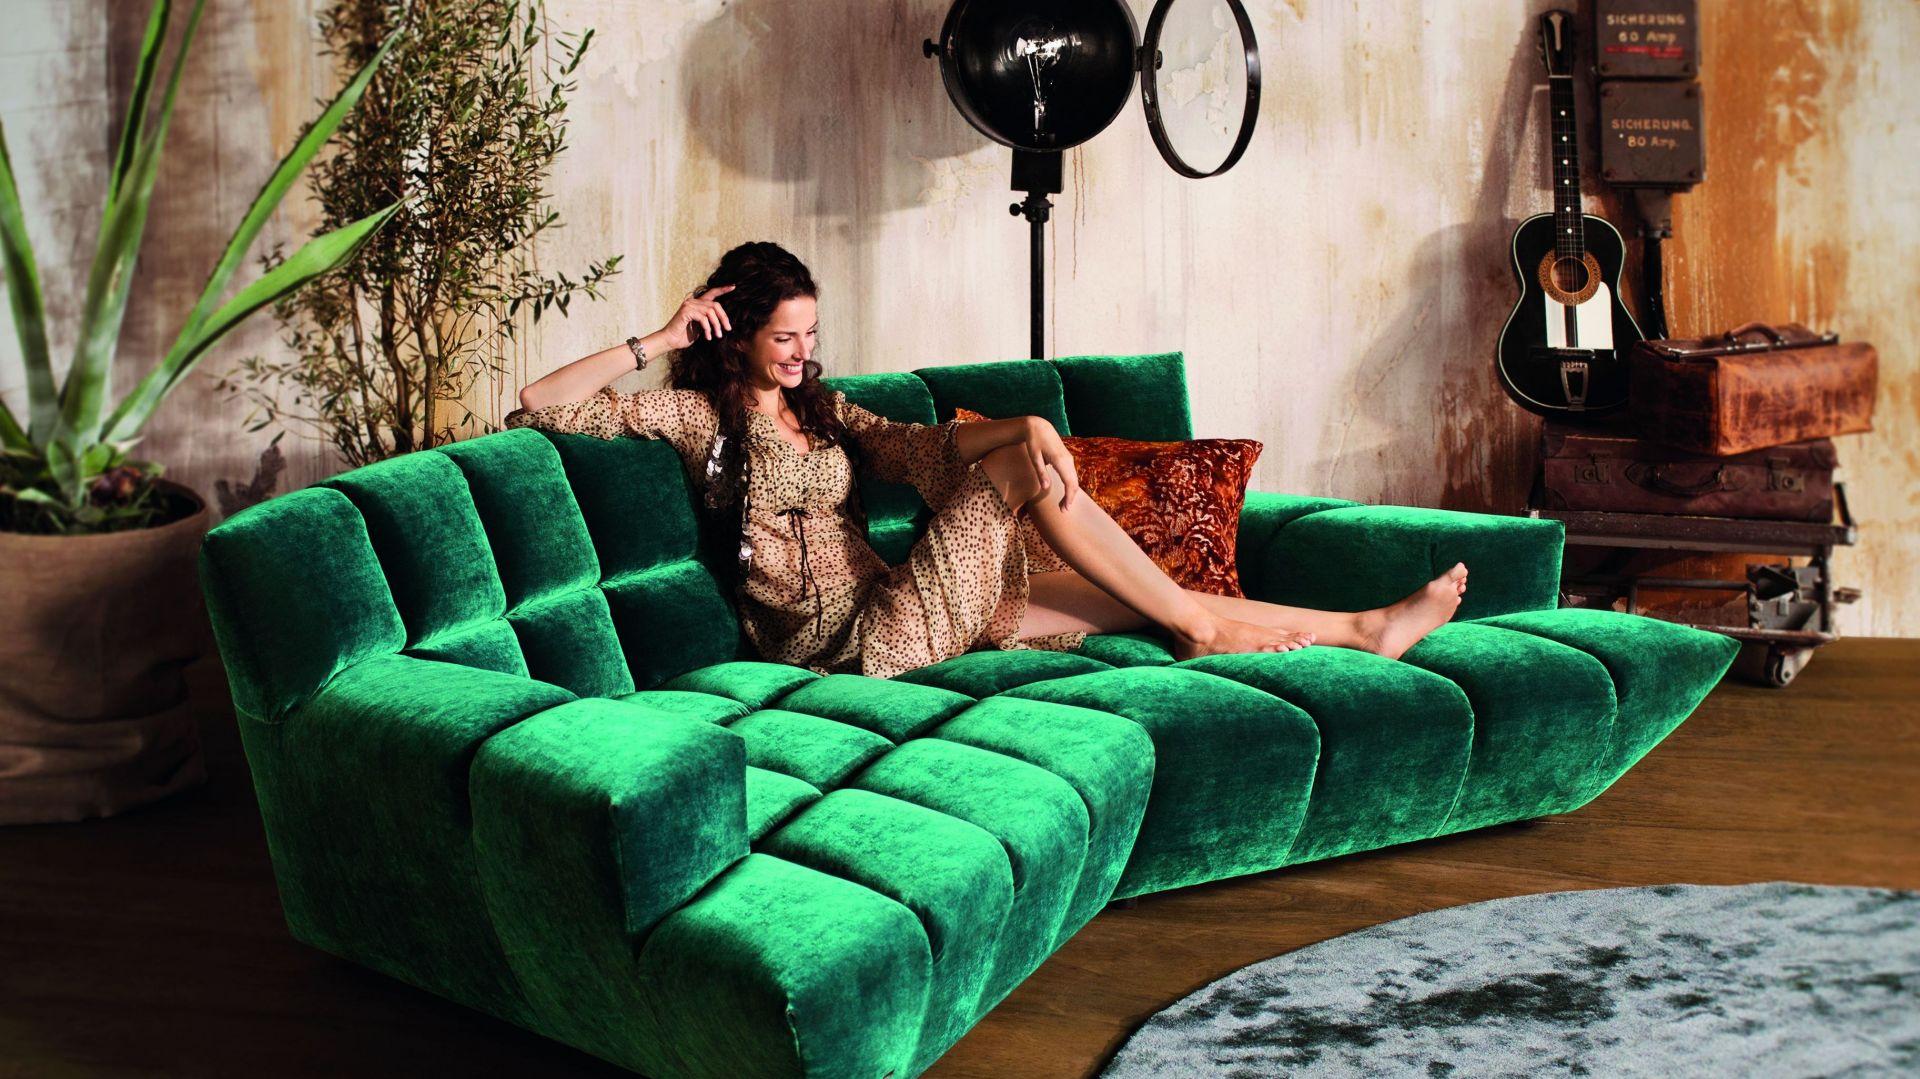 Luksusowa kolekcja mebli modułowych Cloud 7 marki Bretz. Fot. Bretz / Galeria Heban